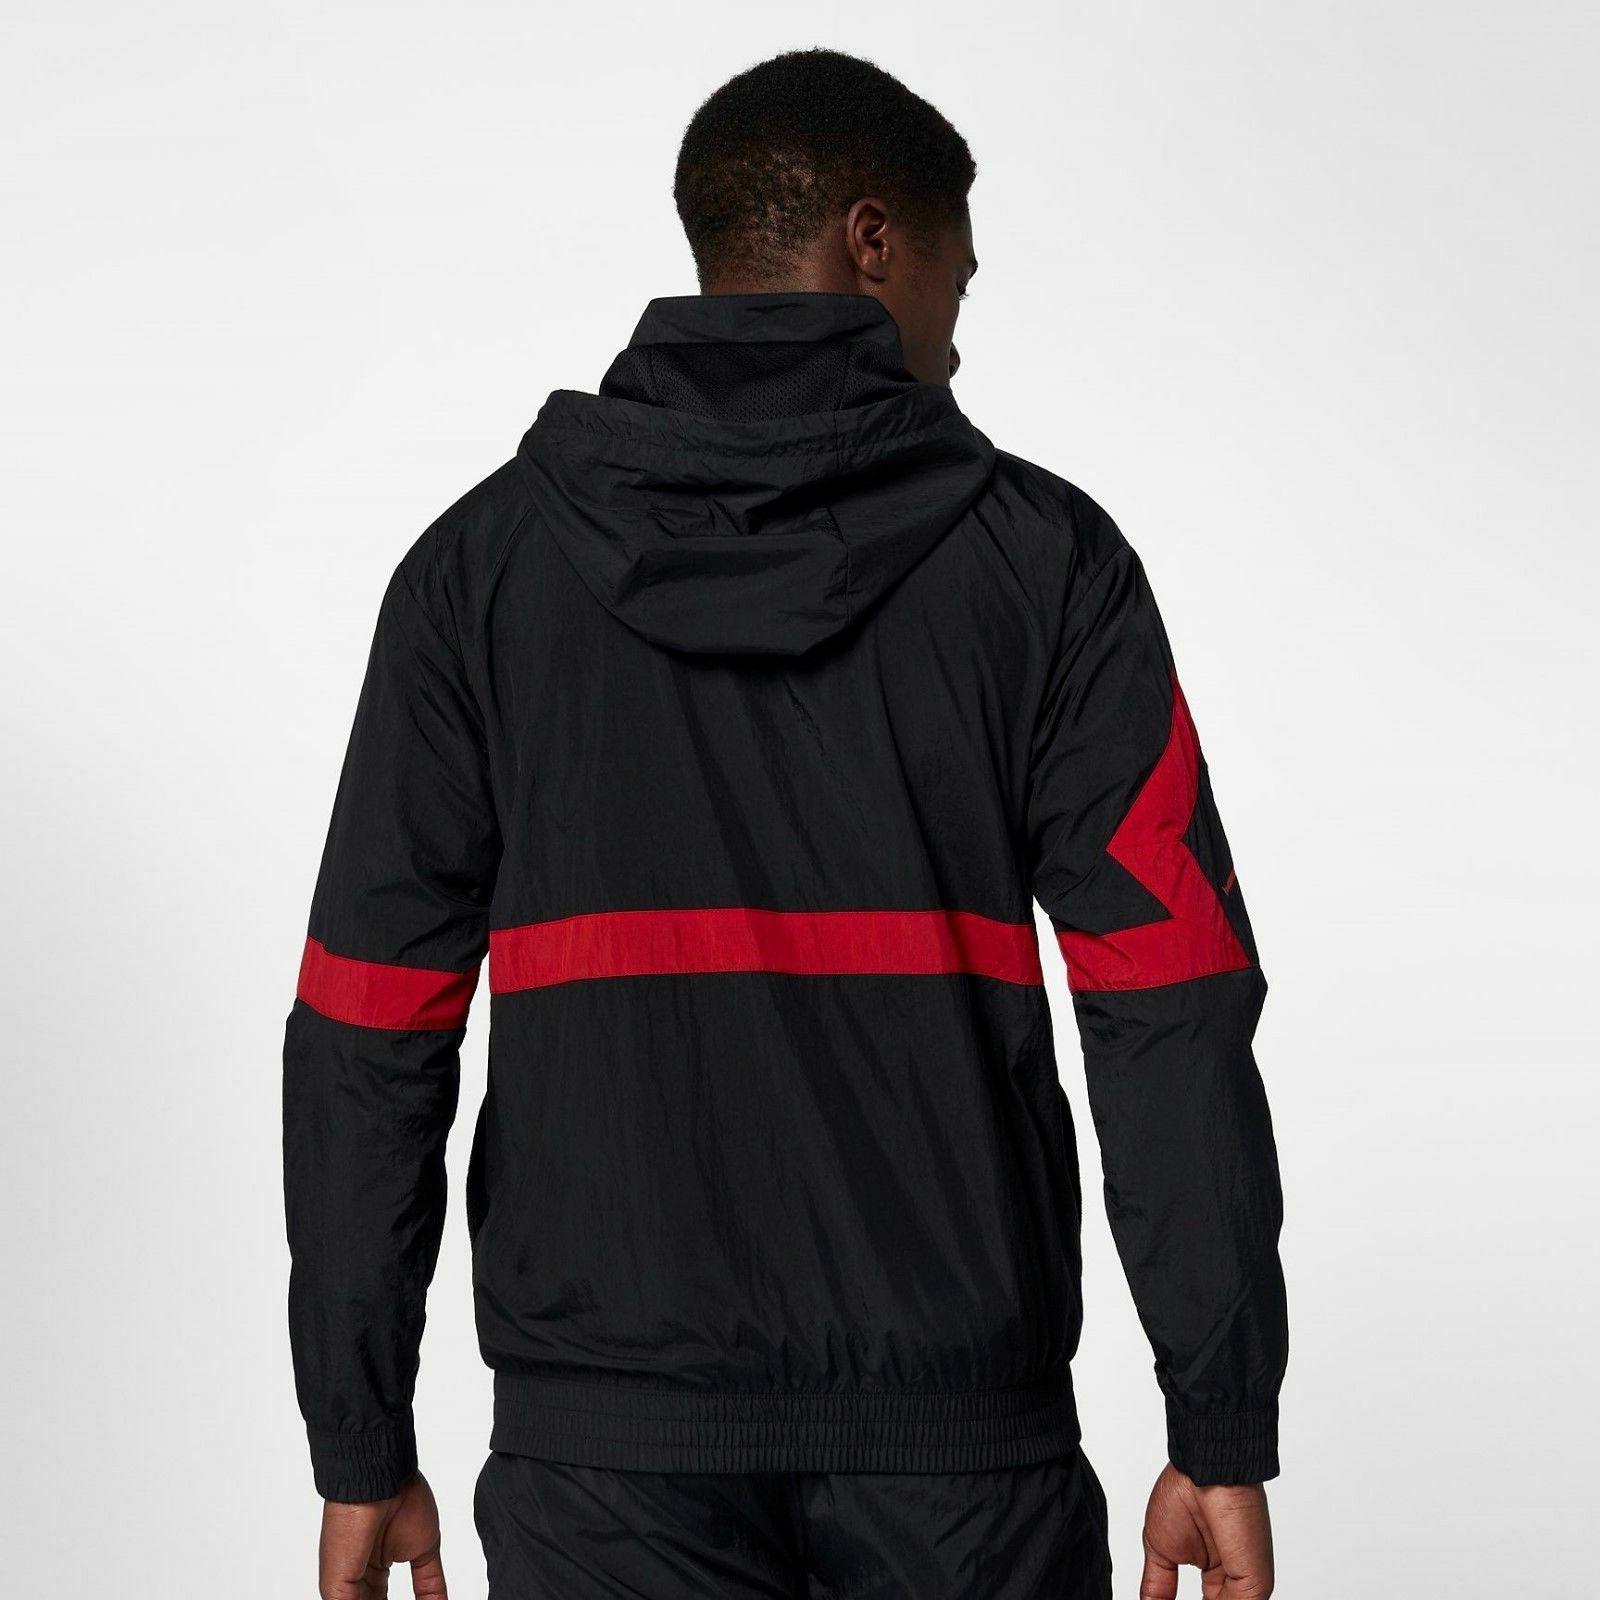 Mens Track Jacket NEW Size 2XL